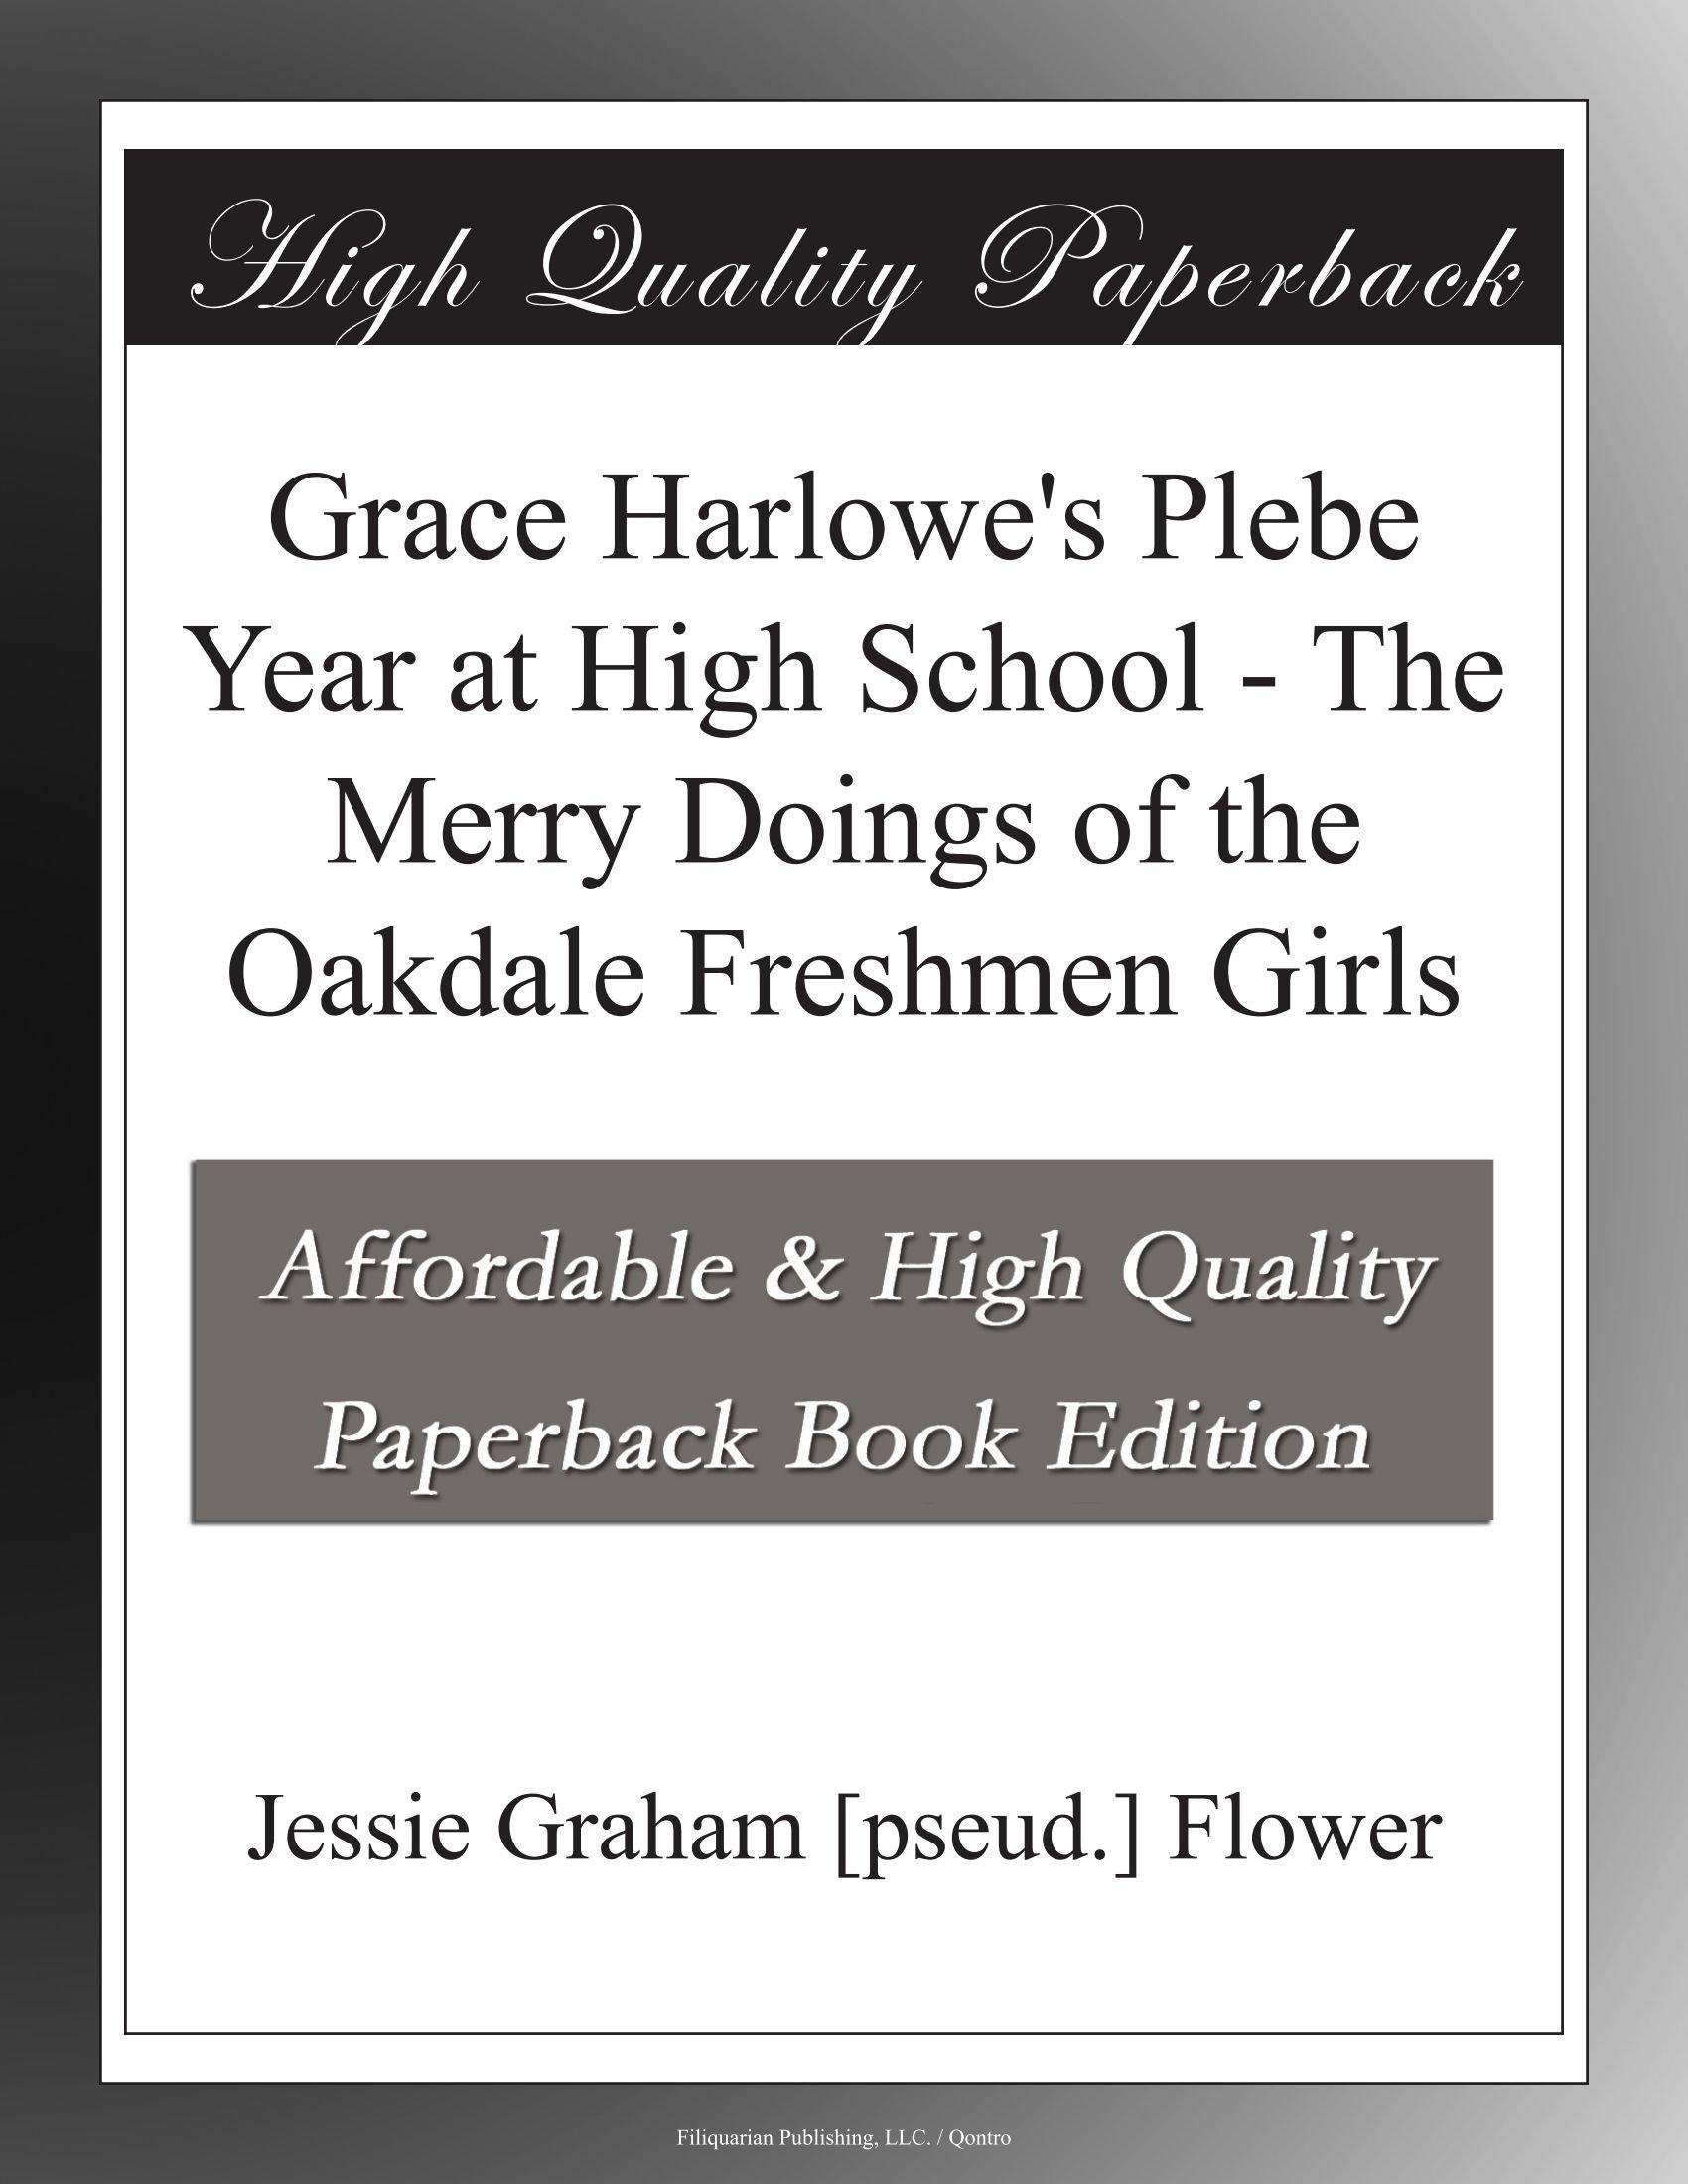 Grace Harlowe's Plebe Year at High School - The Merry Doings of the Oakdale Freshmen Girls pdf